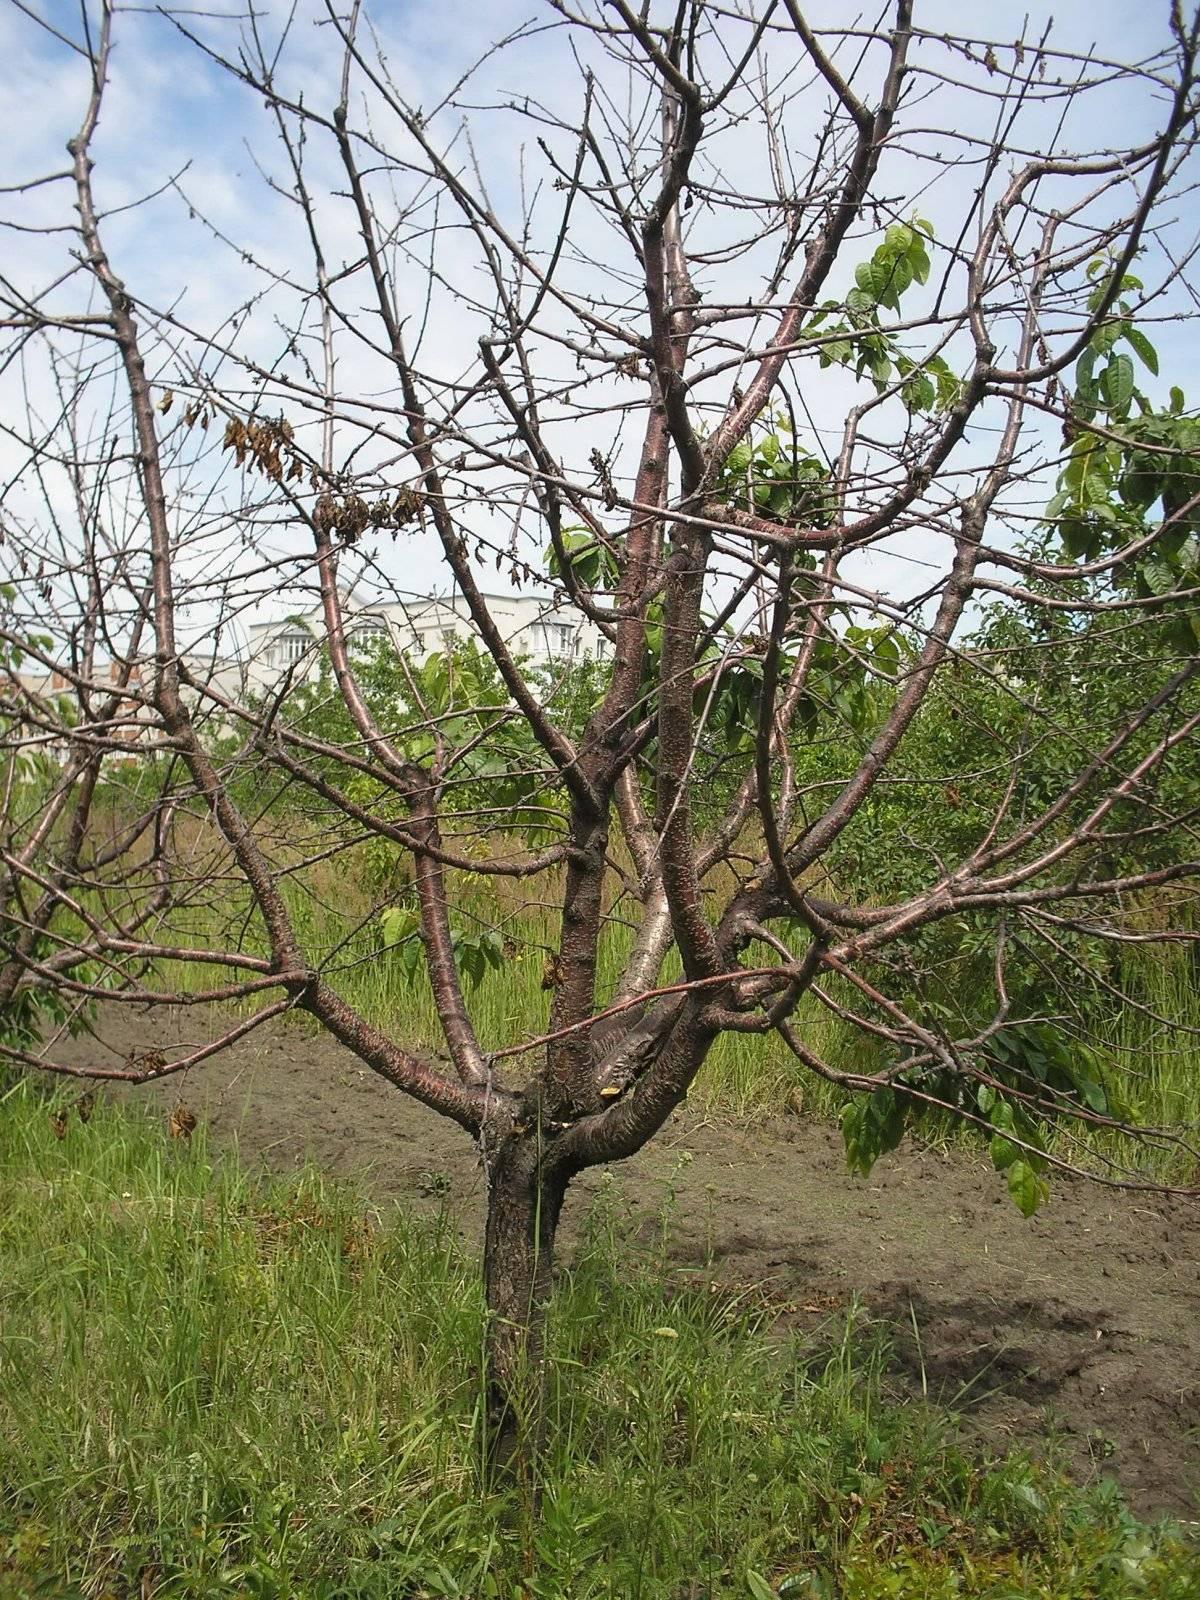 Сонник дерево вишня. к чему снится дерево вишня видеть во сне - сонник дома солнца